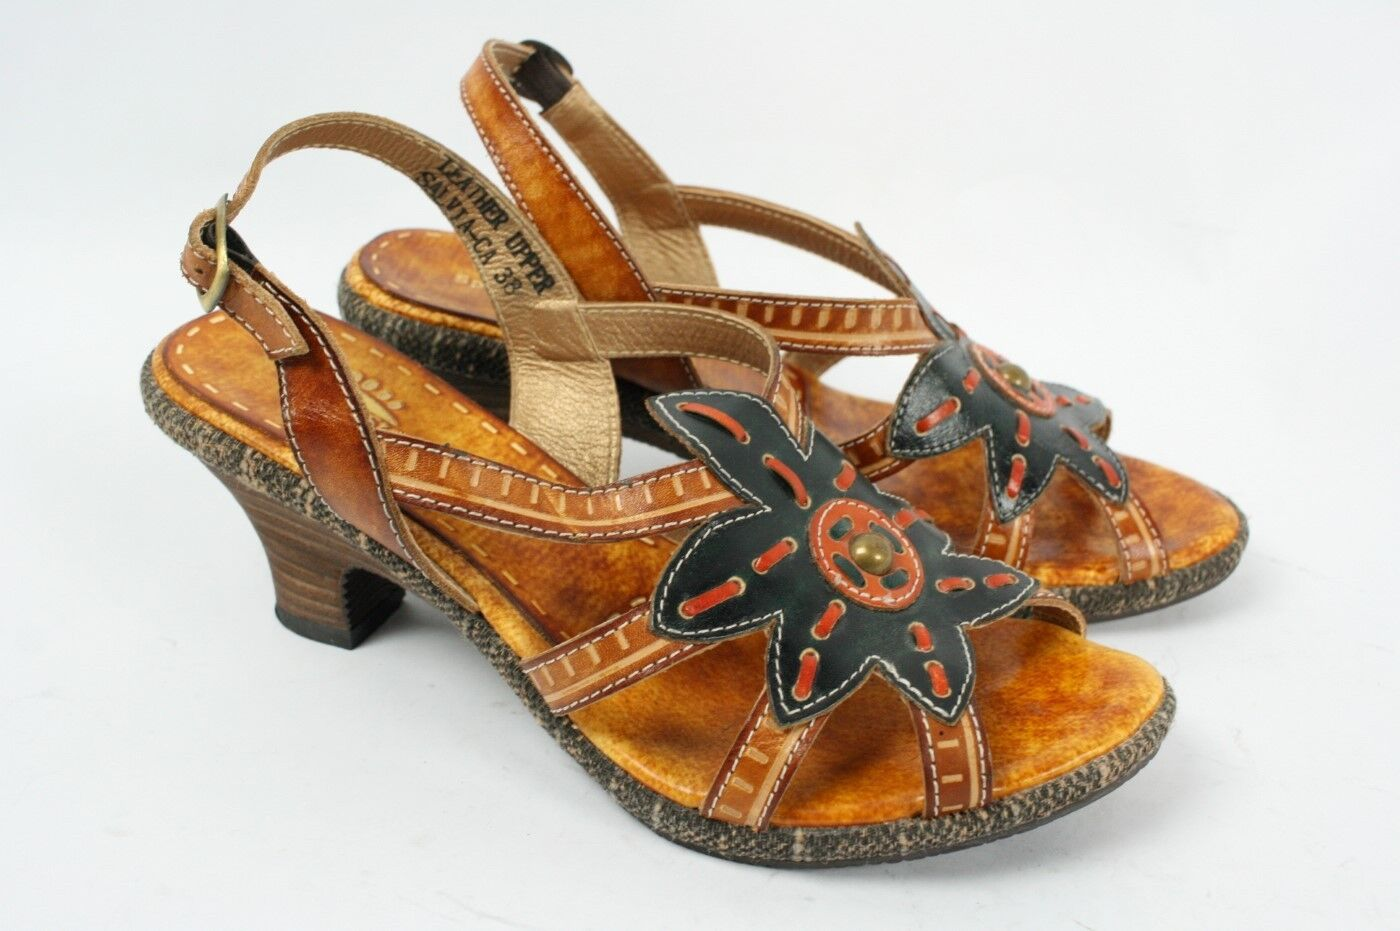 SPRING STEP Salvia Flower Floral Tan Brown Leather Sandal Pumps Women 38 7.5 8